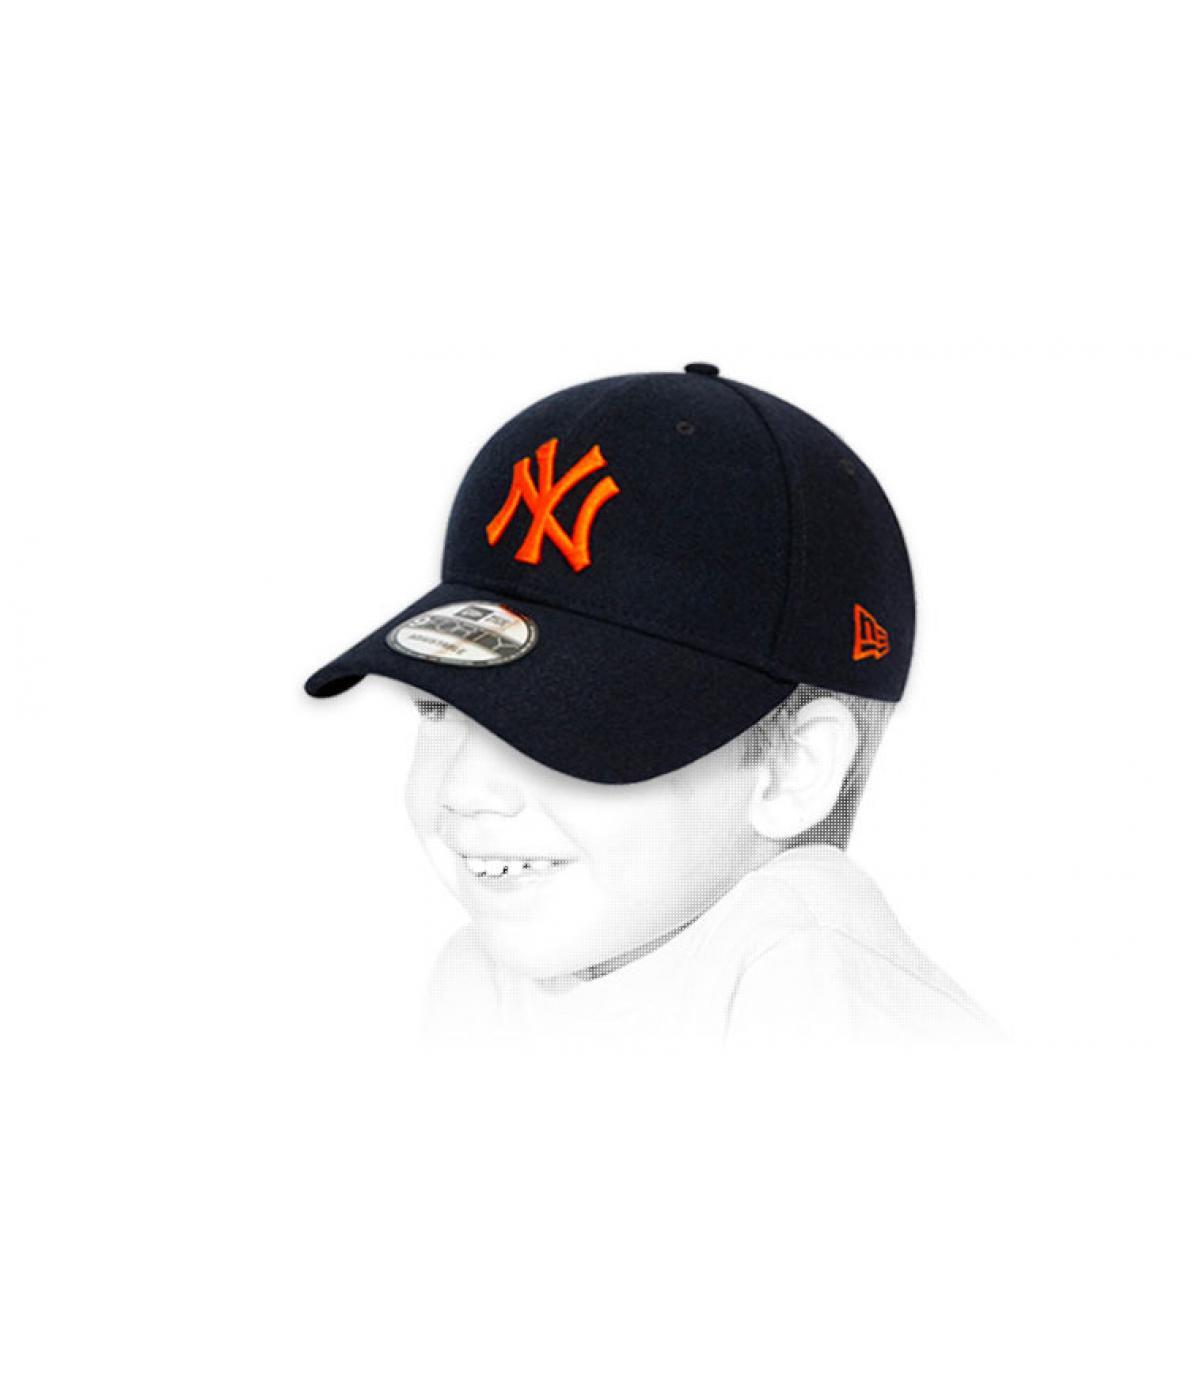 black NY children cap